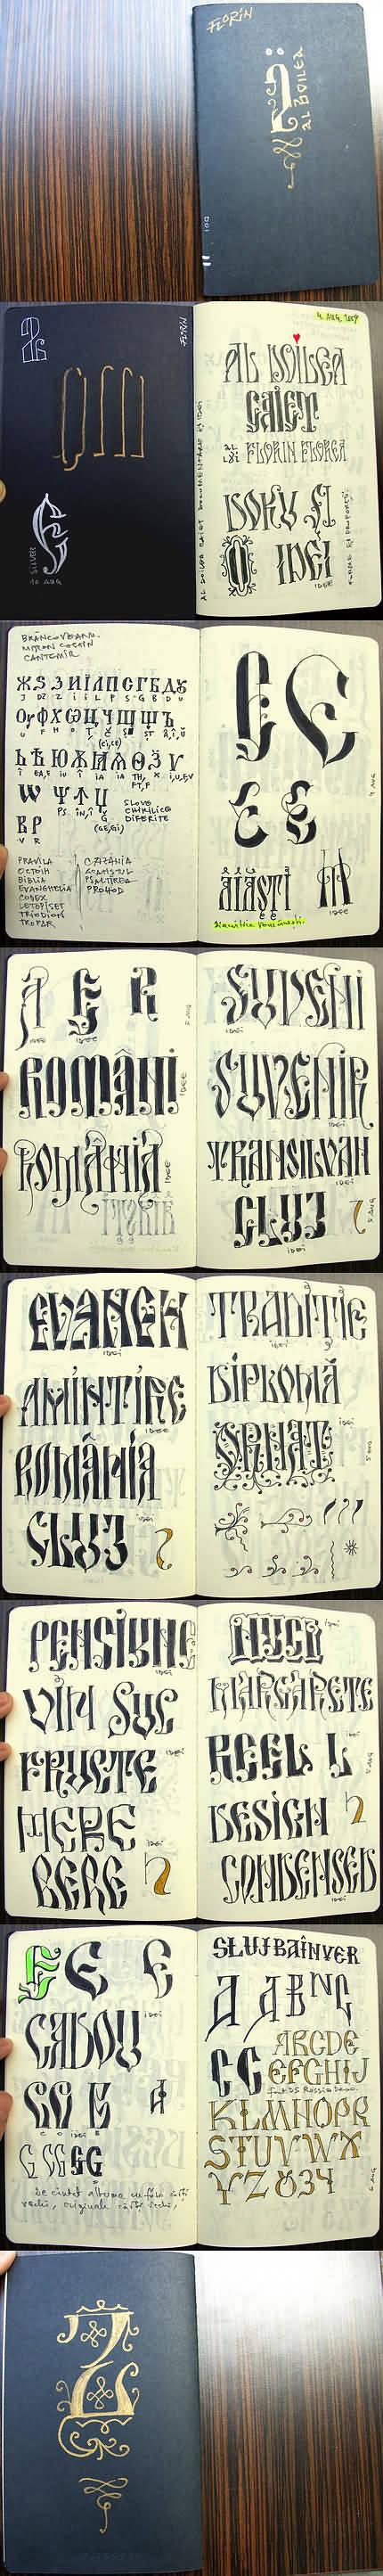 Caiet de schite 2 - Arhaic Românesc - Florin Florea